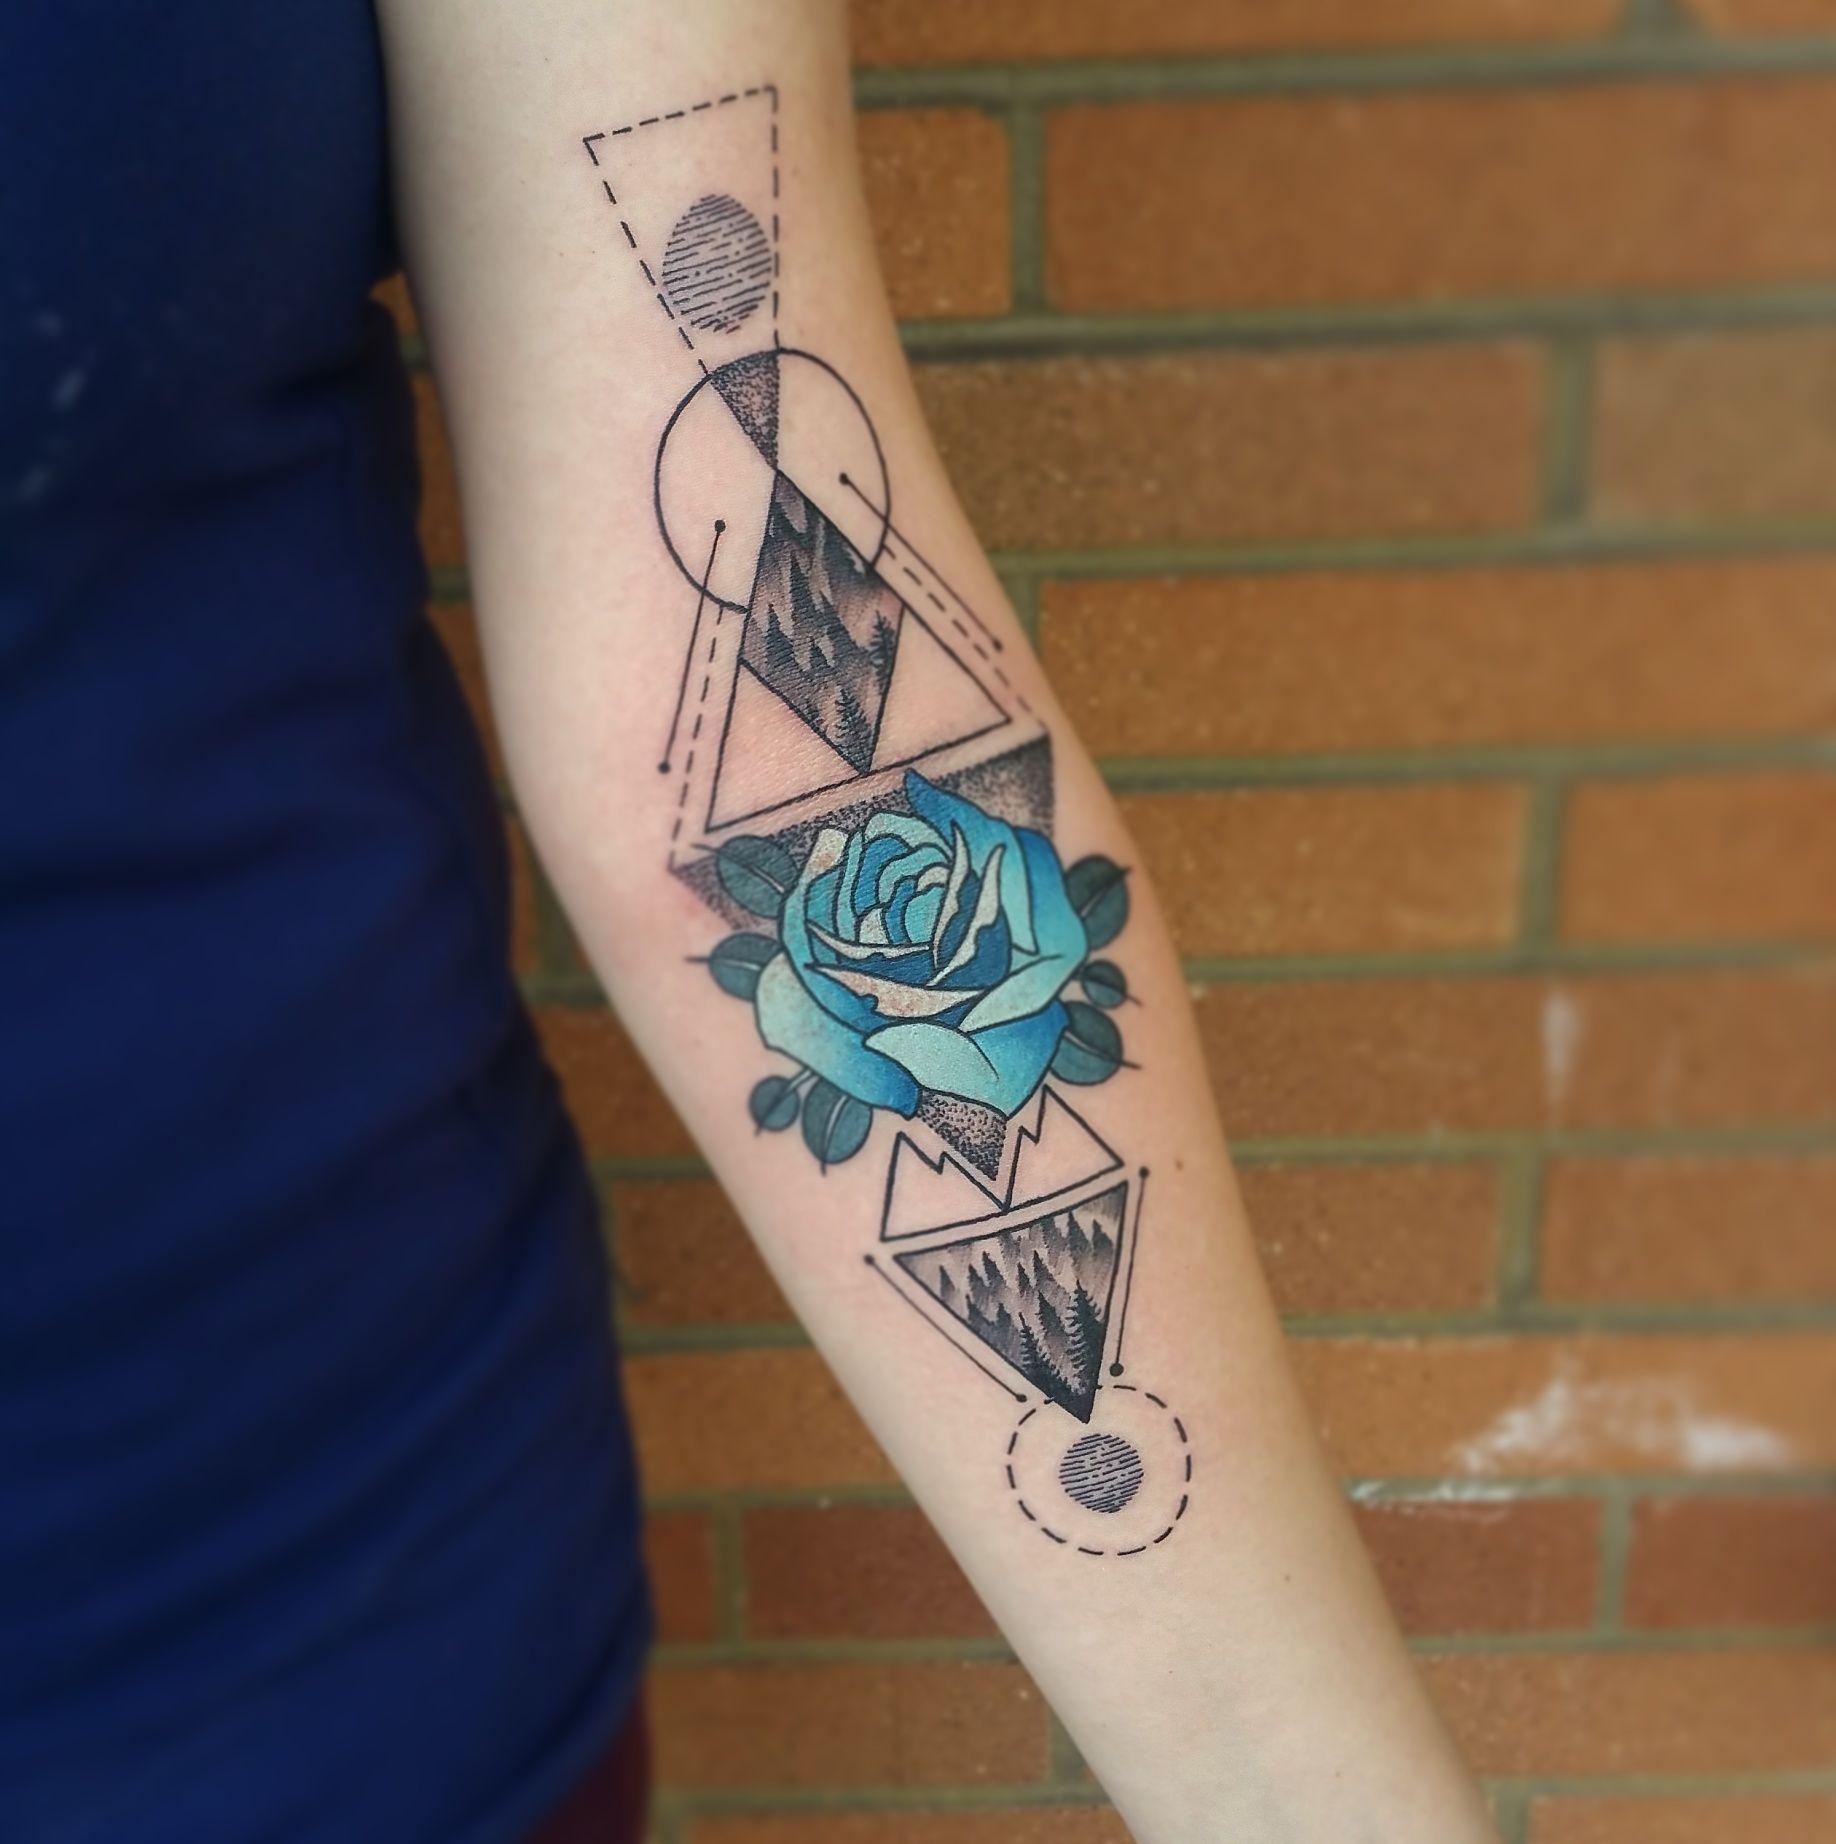 Twin Peaks Tribute By Me Logan Bramlett Wanderlust Tattoo Society